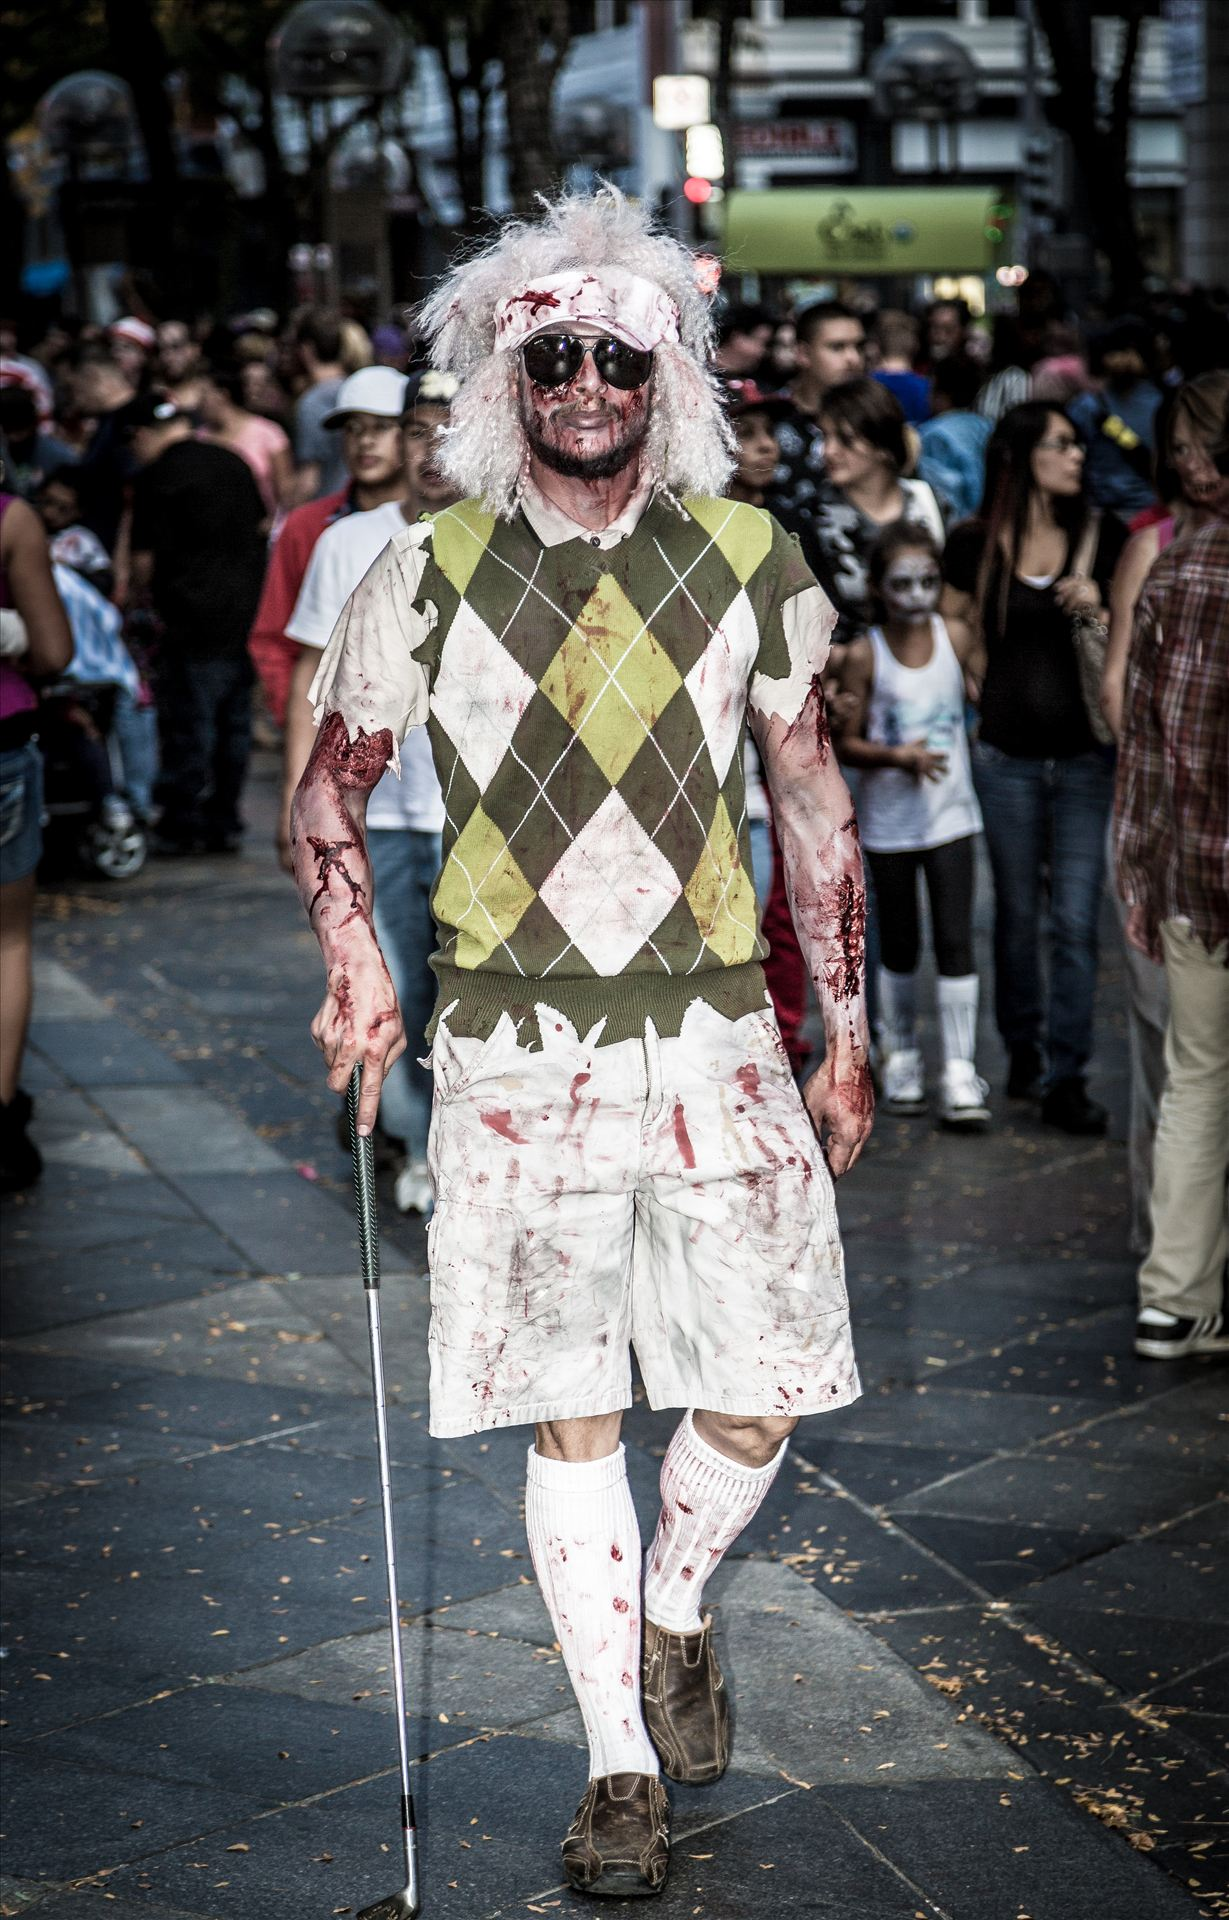 Denver Zombie Crawl 2015 22 -  by D Scott Smith